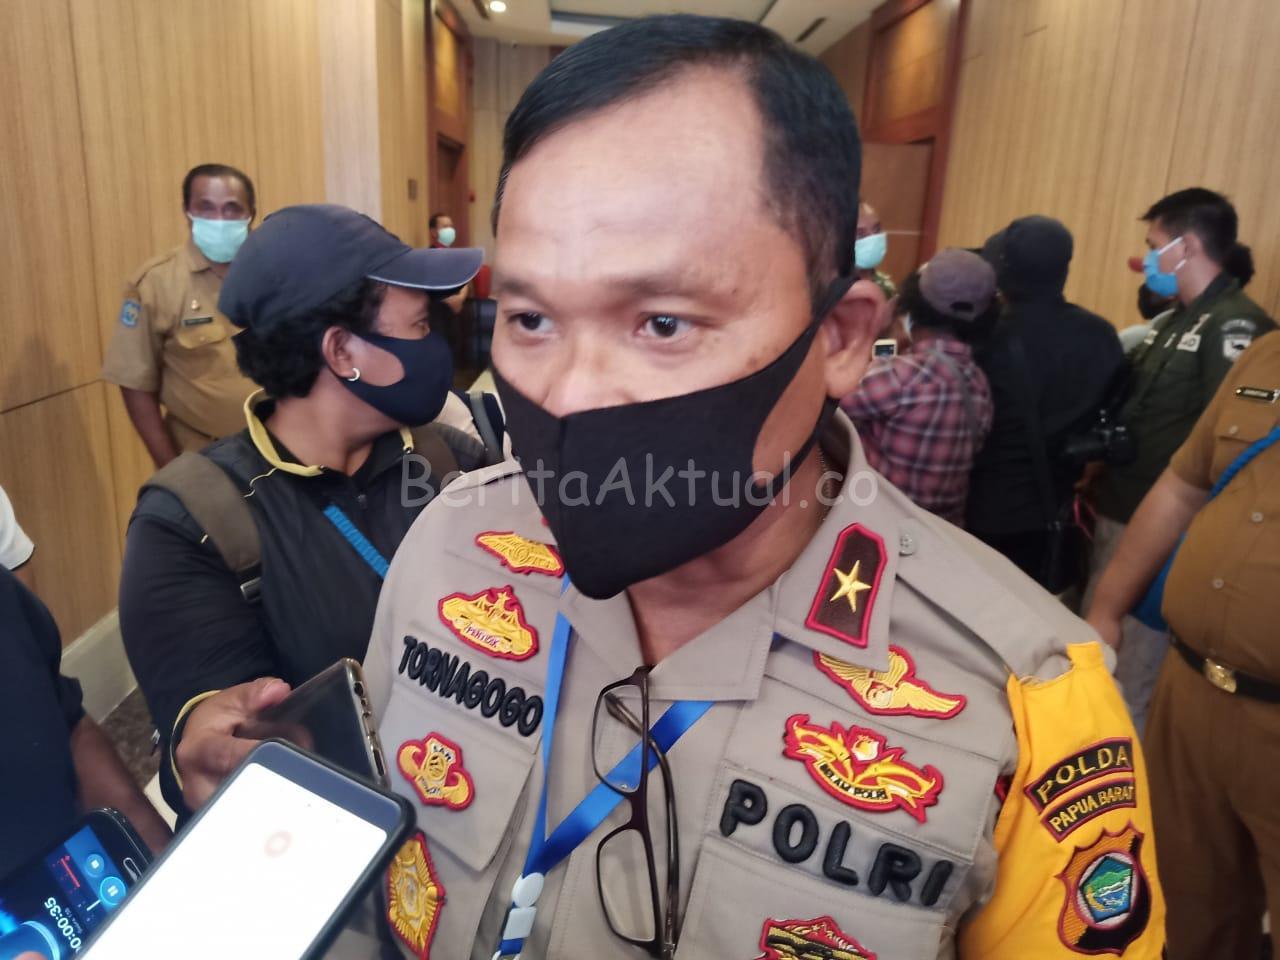 Polda Papua Barat Naik Tipe A, Akan Dipimpin Jenderal Bintang Dua 24 IMG 20200420 WA0055